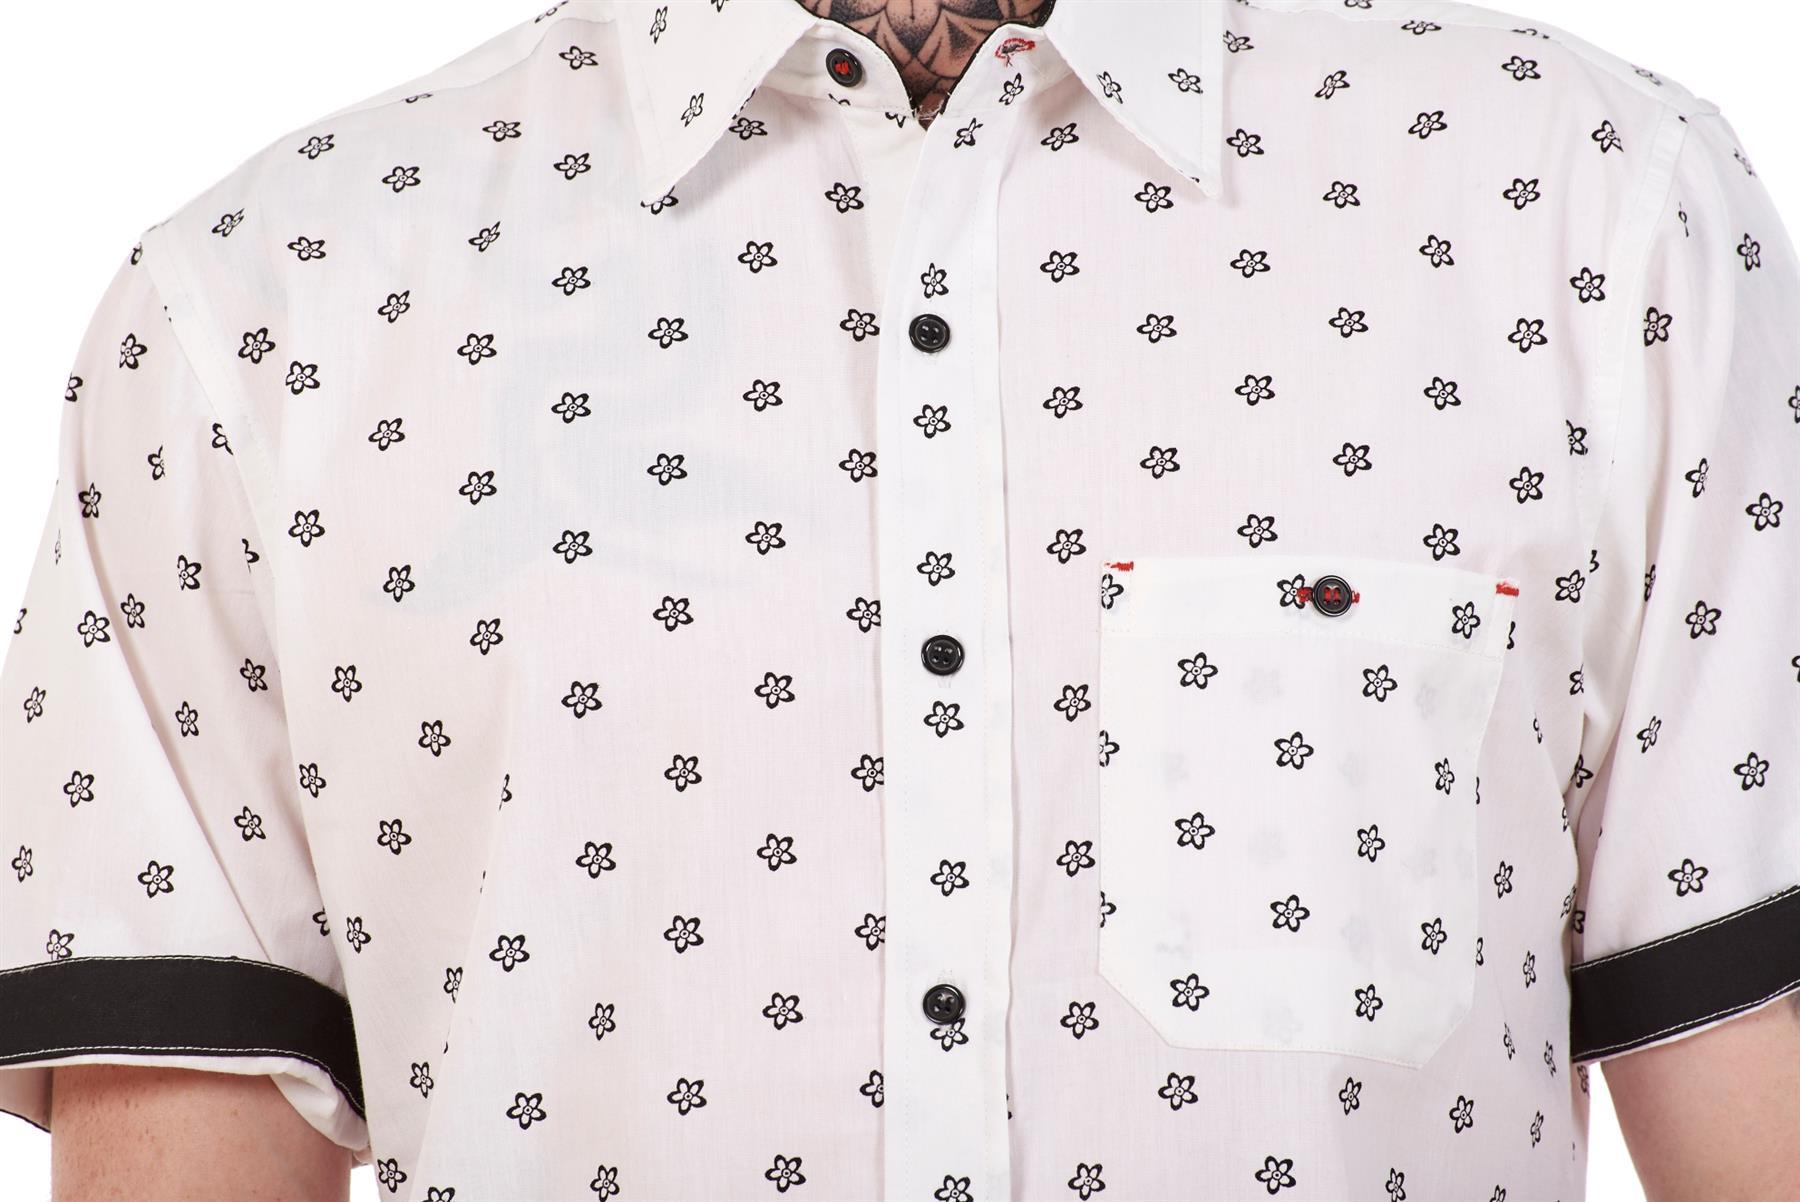 Mens-100-Cotton-Printed-Shirt-Short-Sleeve-Regular-Big-Size-Casual-Top-M-to-5XL thumbnail 21